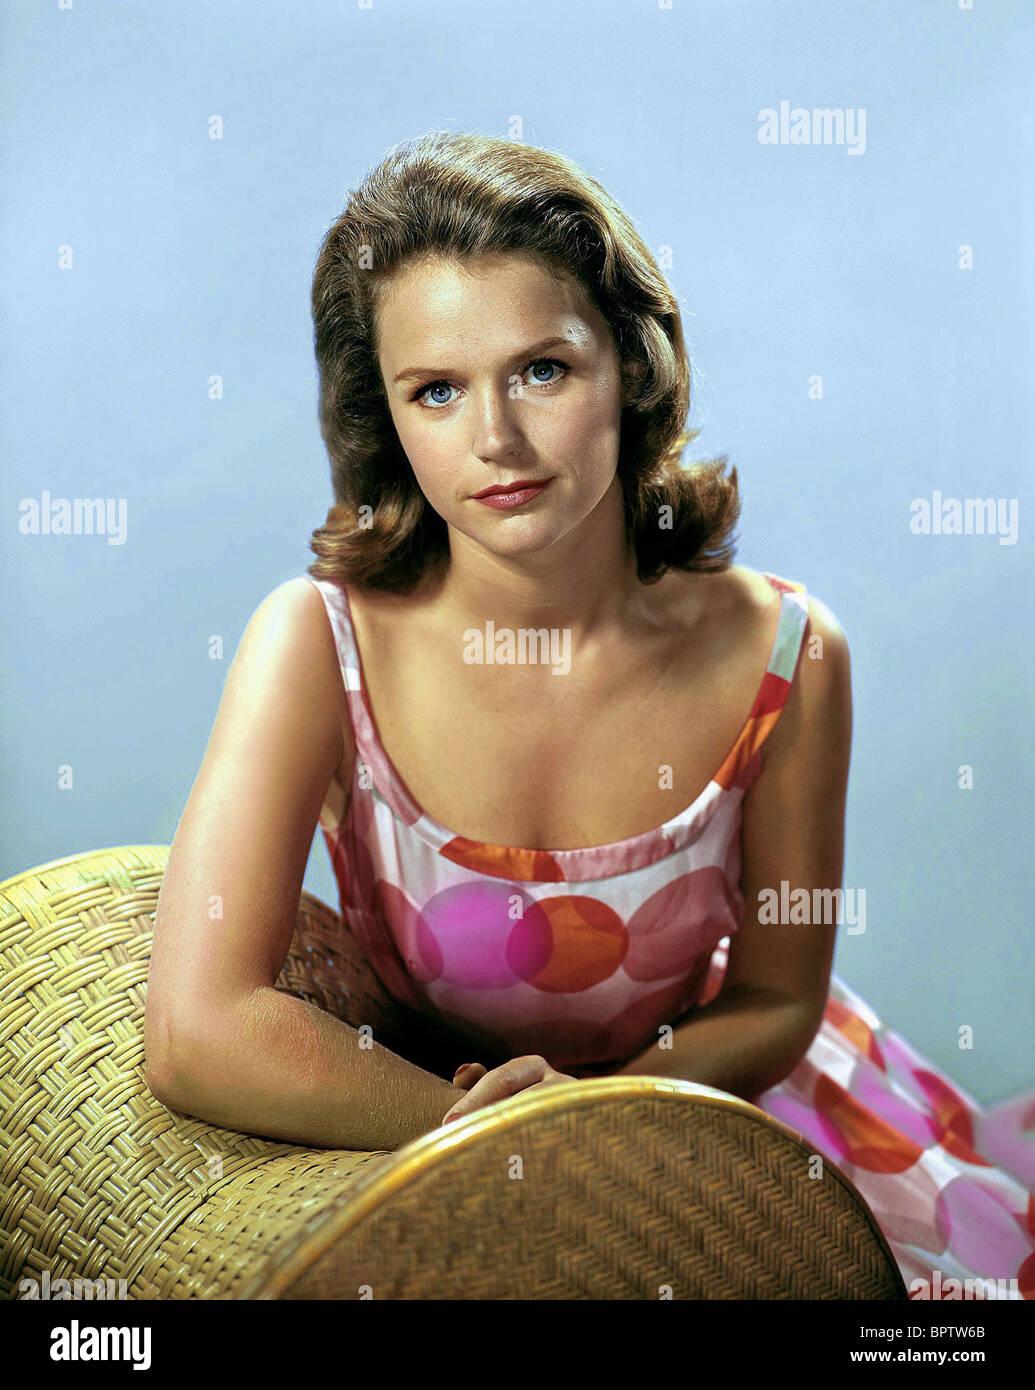 LEE REMICK ACTRESS (1958) - Stock Image